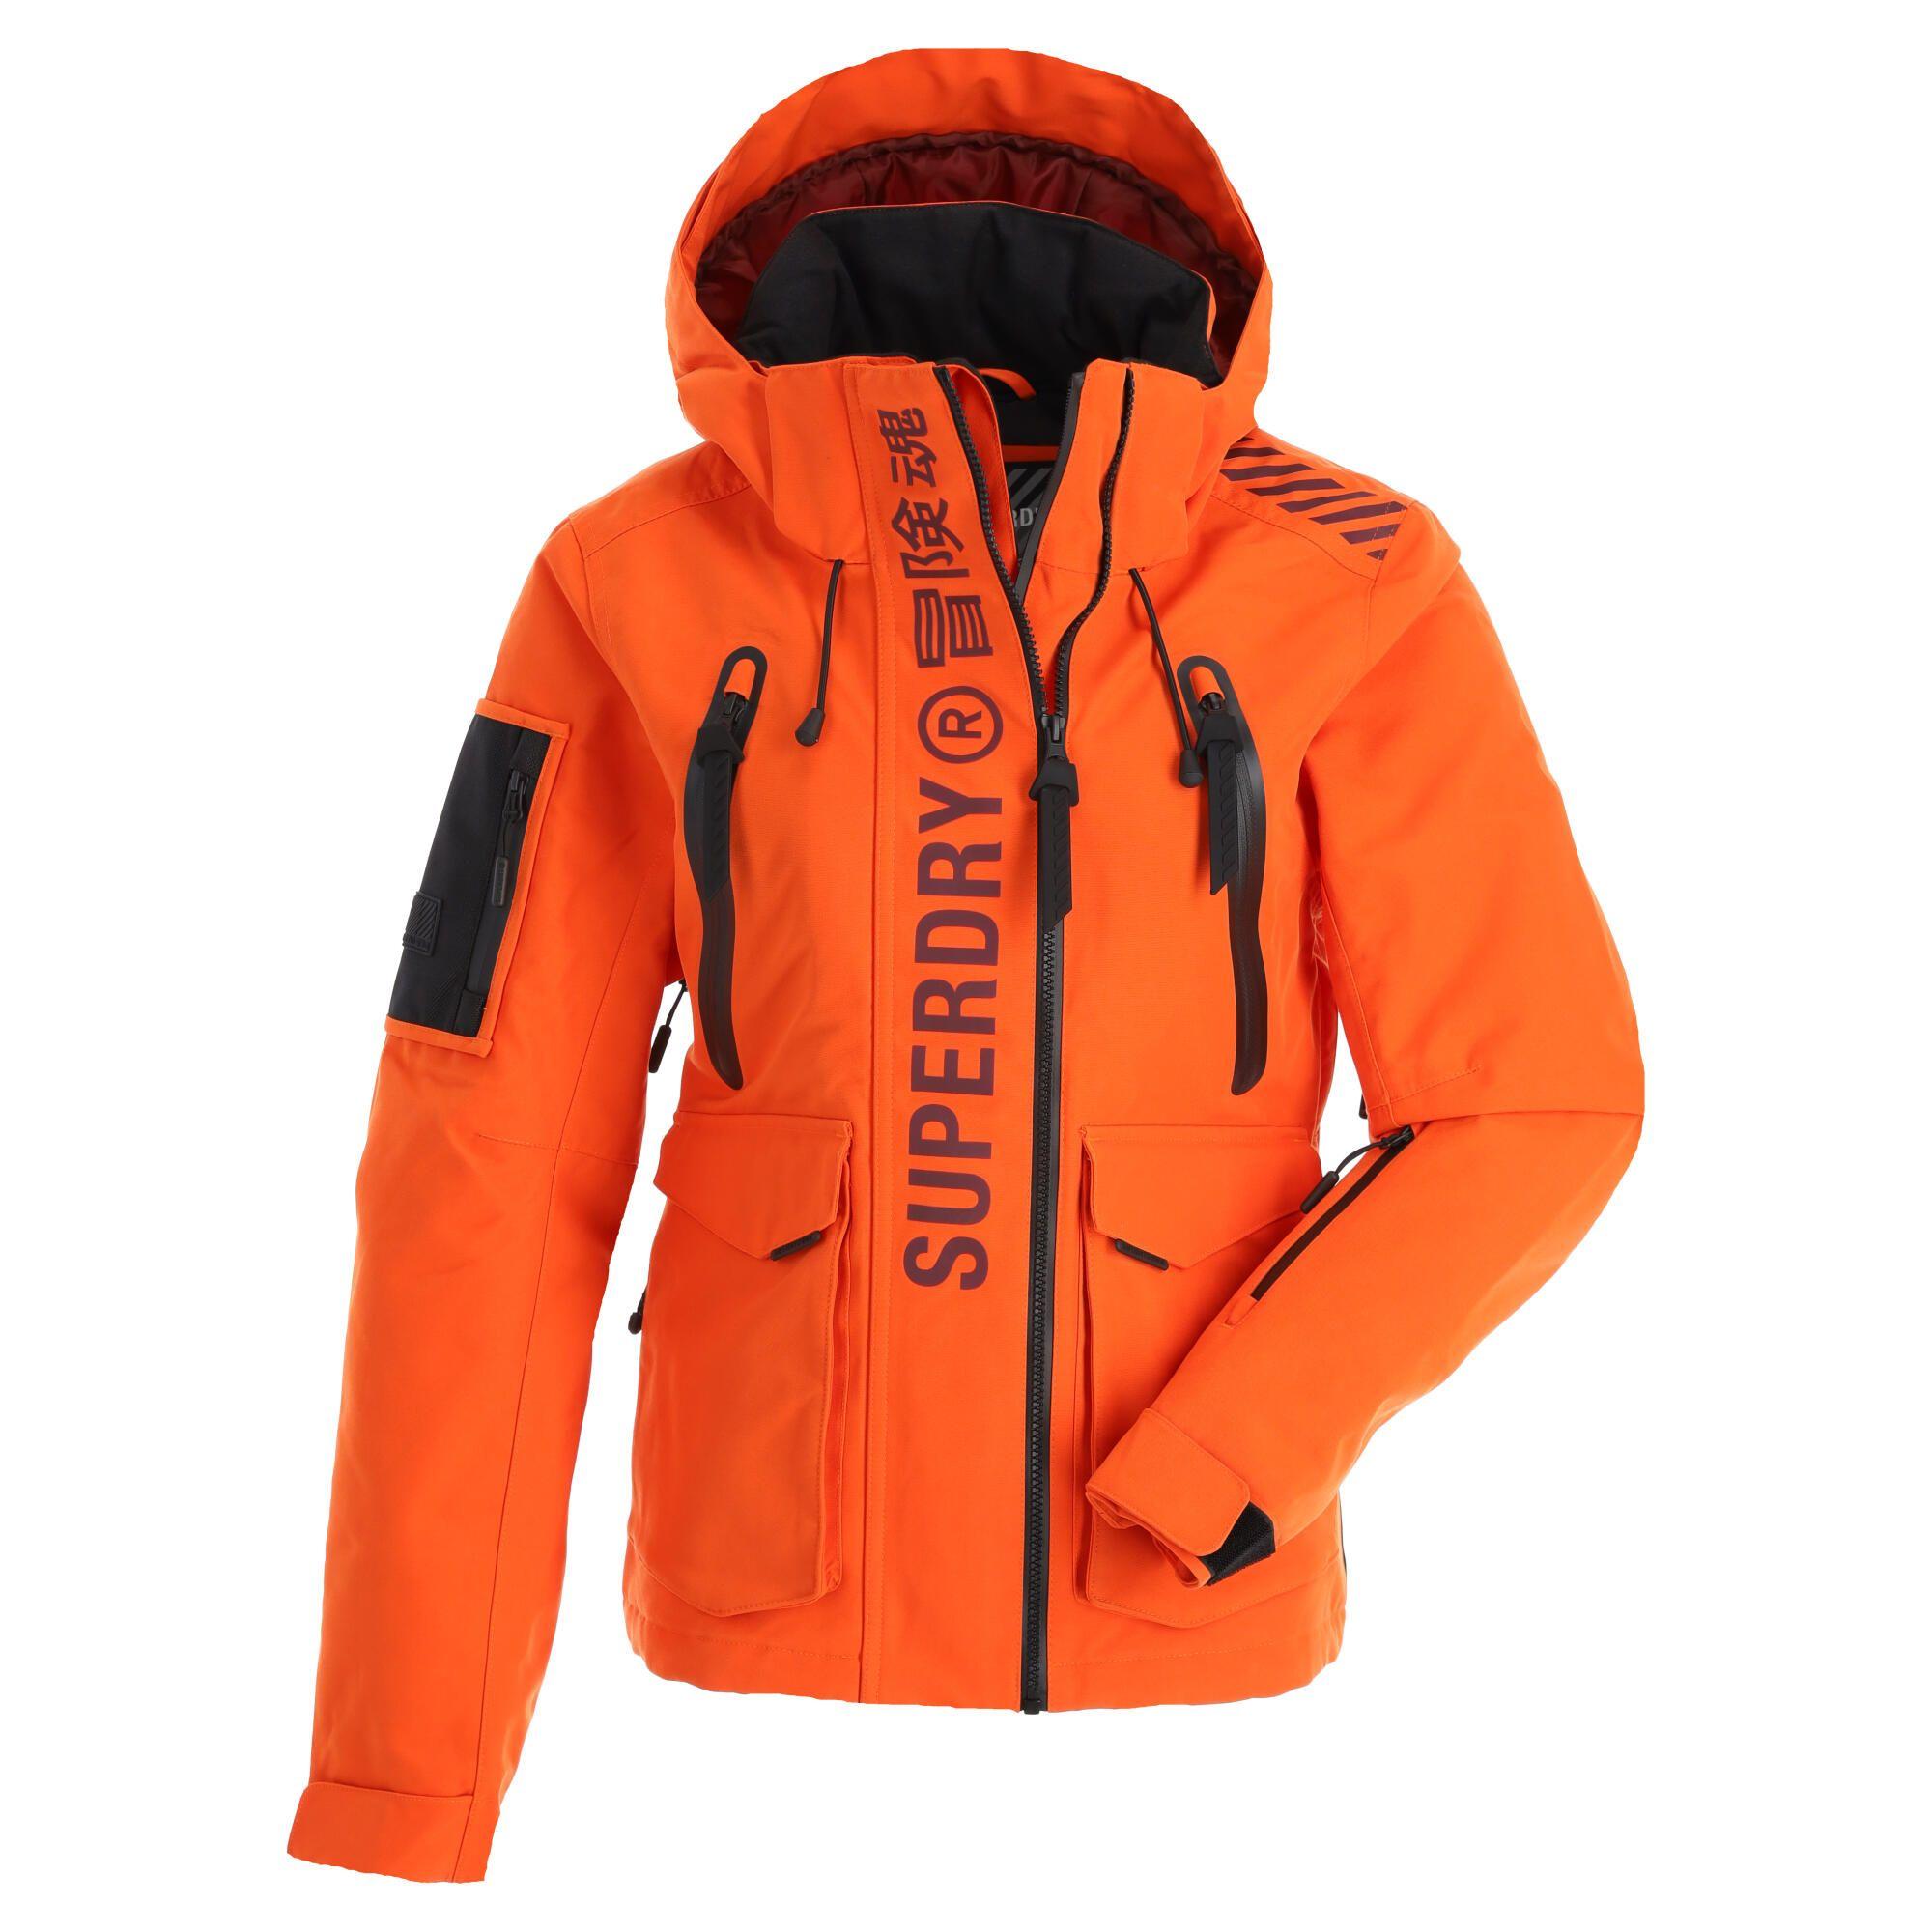 Superdry Ultimate Rescue Jacket Ski Jacket Women Havana Orange Skiwebshopskiwebshop Com